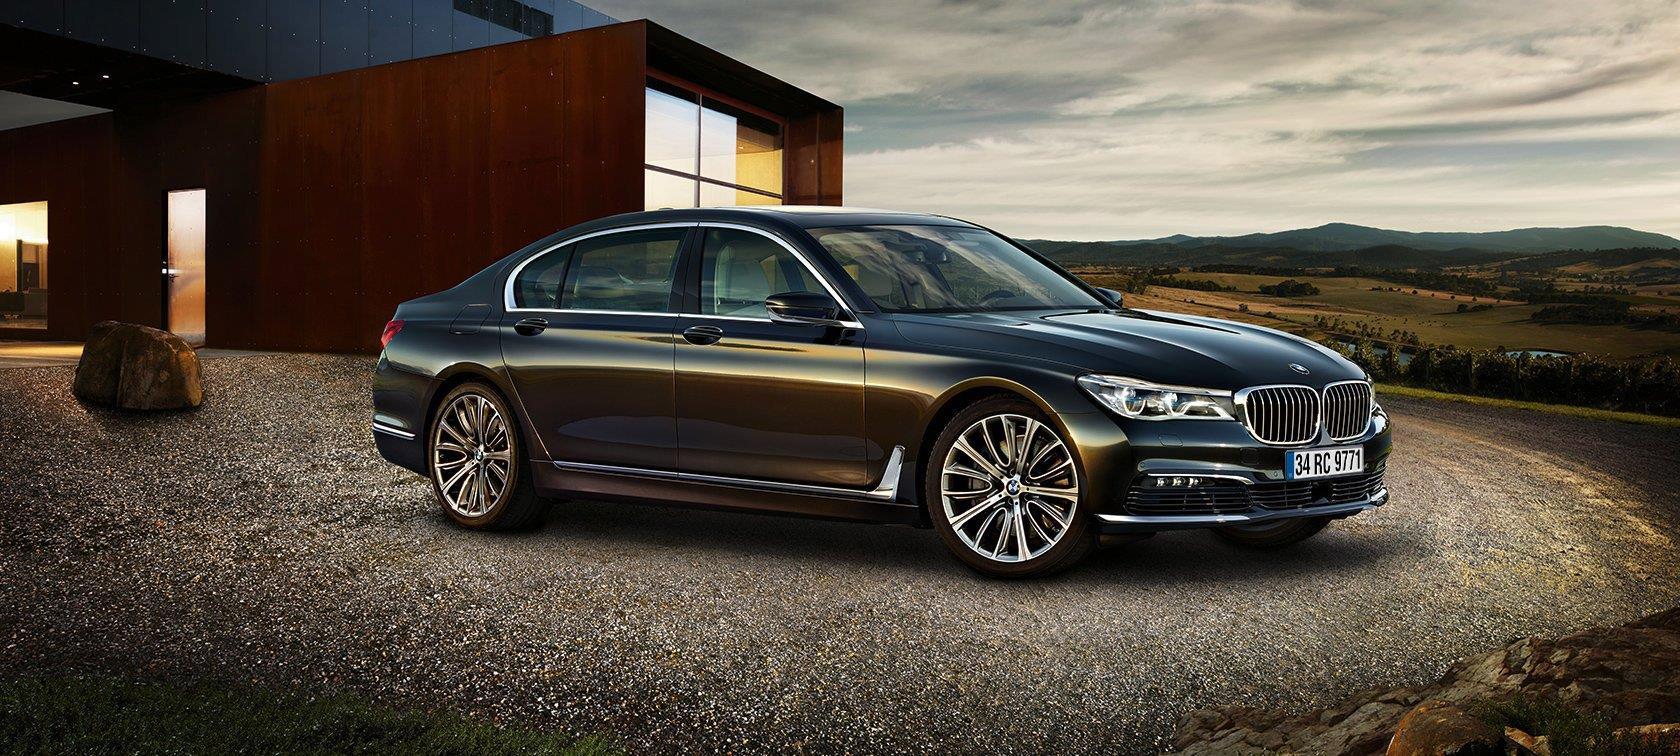 BMW 7 Serisi Sedan